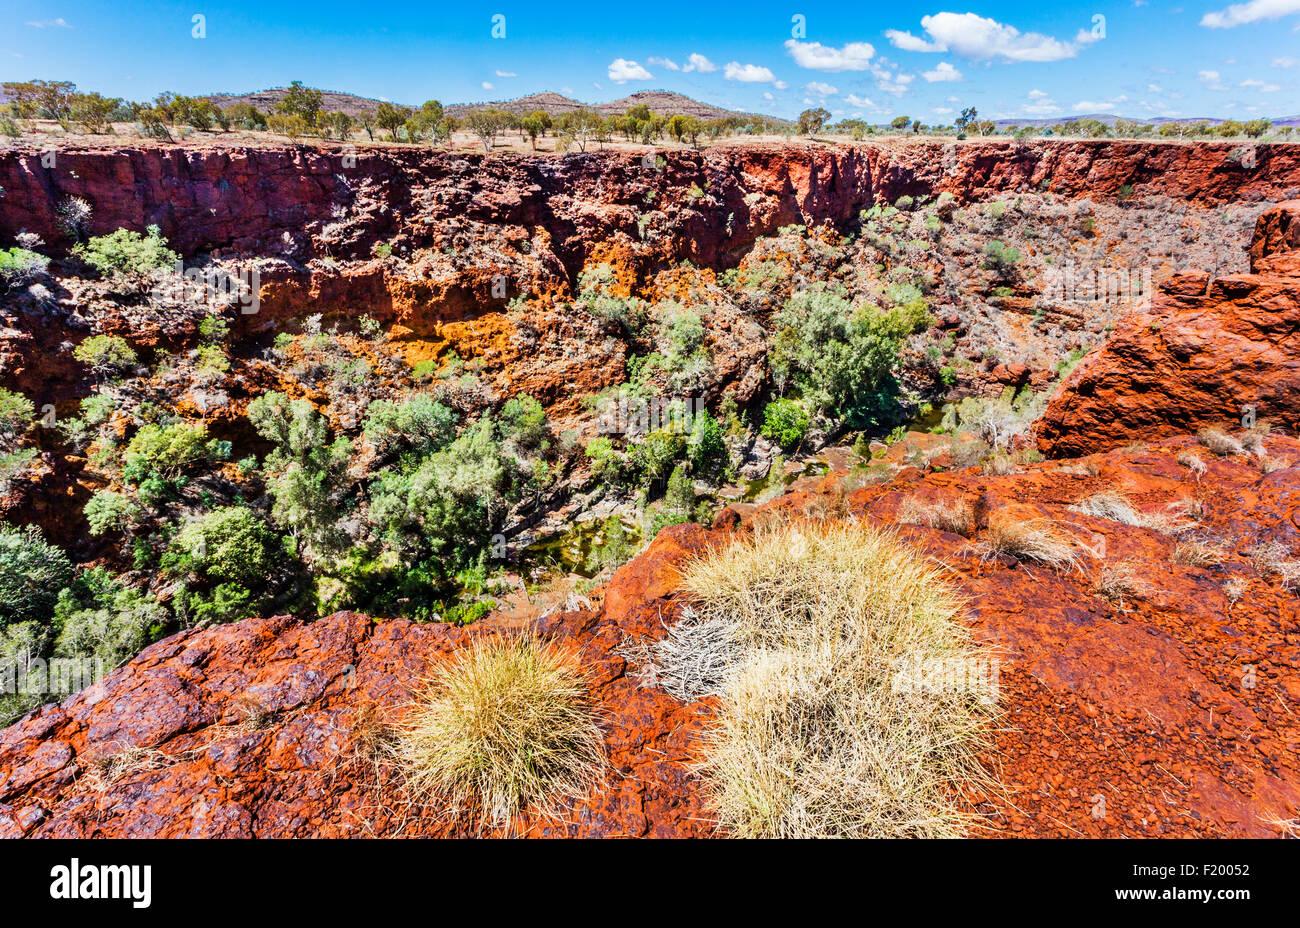 Australia, Western Australia, Pilbara, Hamersley Range, Karijini National Park, view from the rim of Dales Gorge - Stock Image